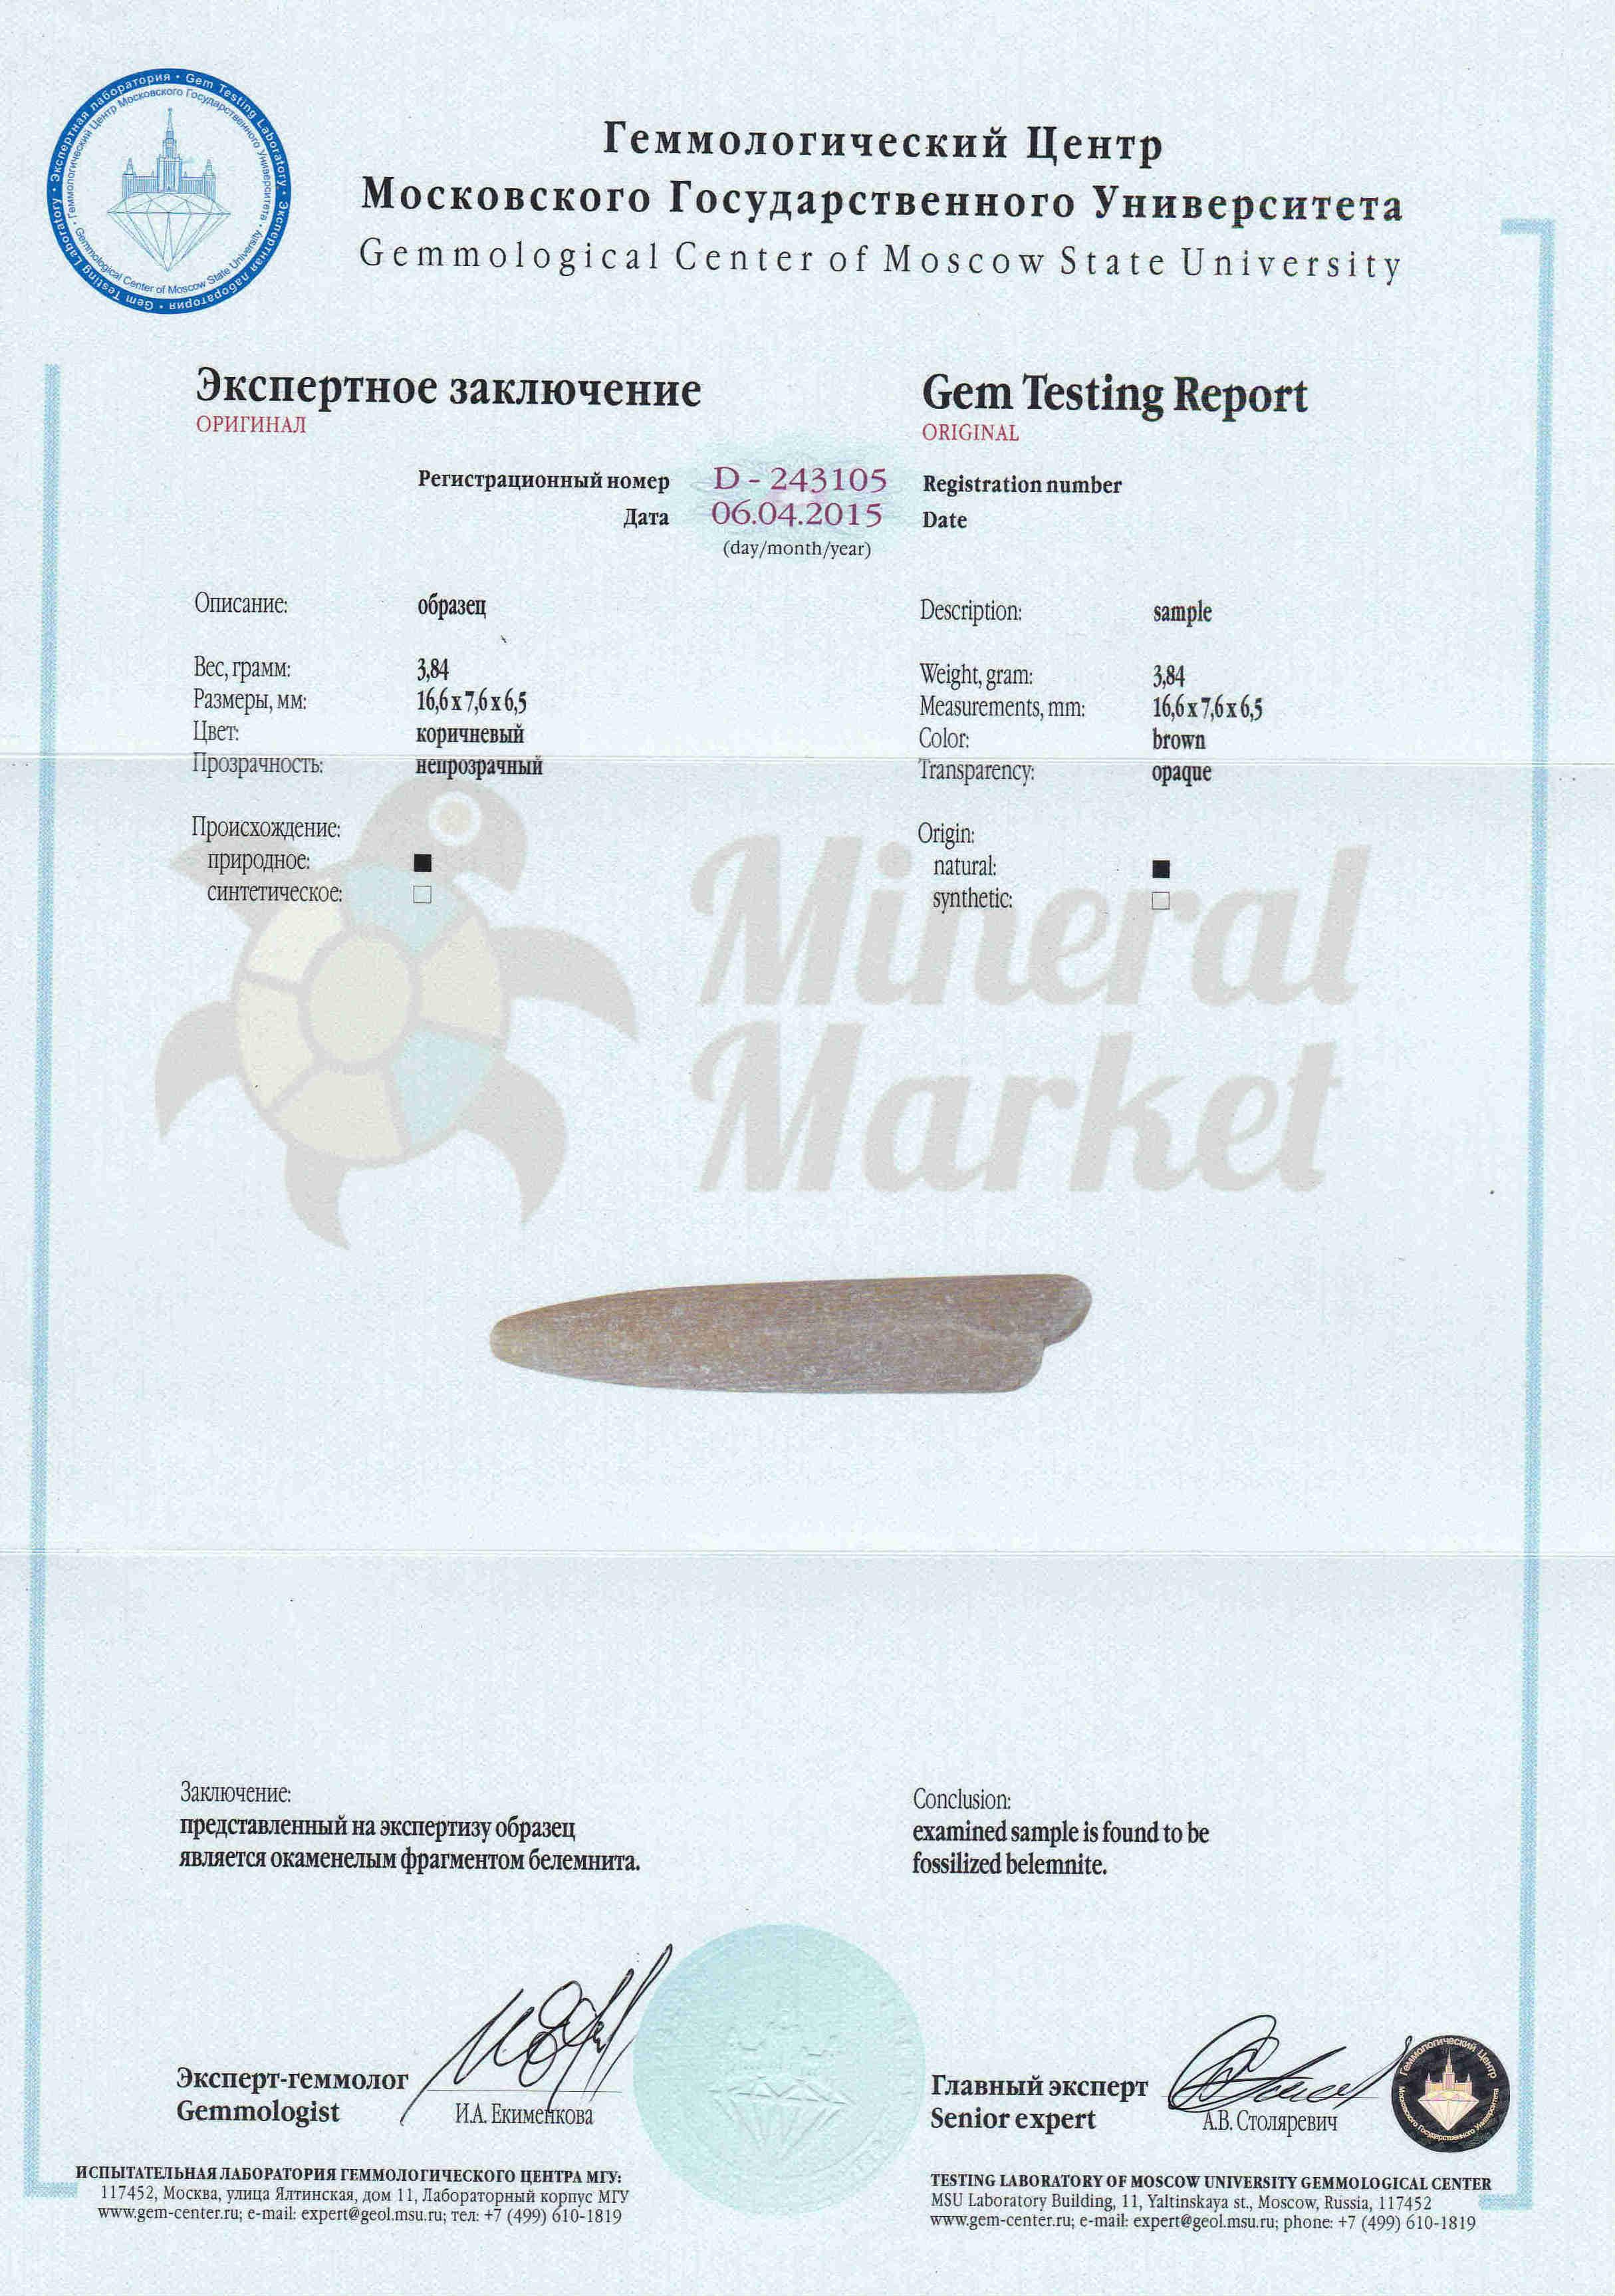 https://mineralmarket.ru/img/certificate/19/19.jpg